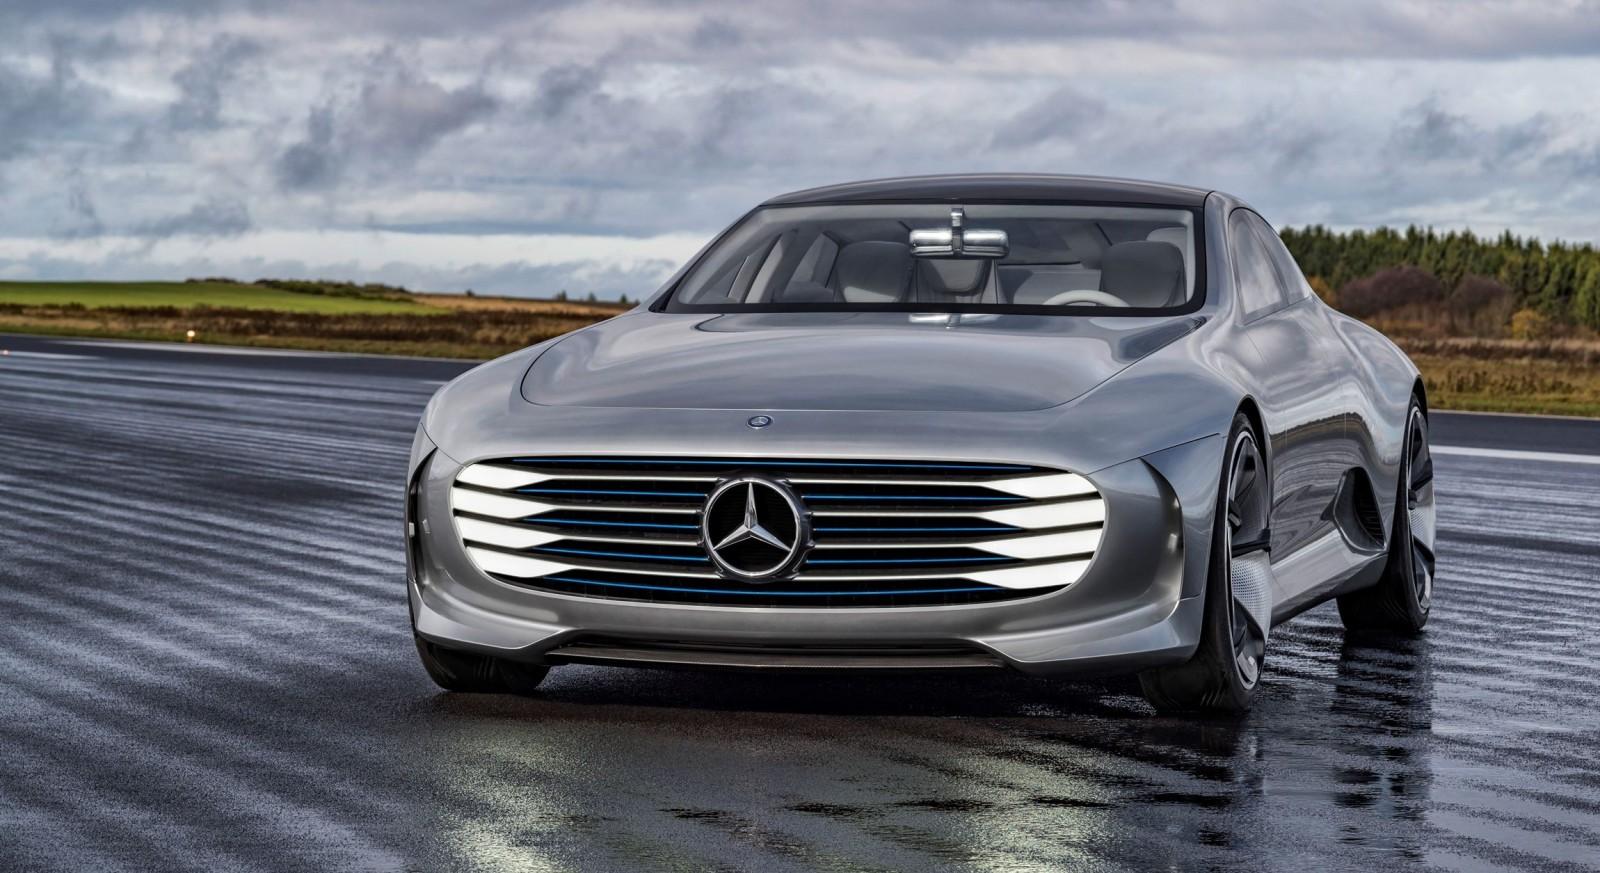 2015 mercedes benz concept iaa for Mercedes benz concept